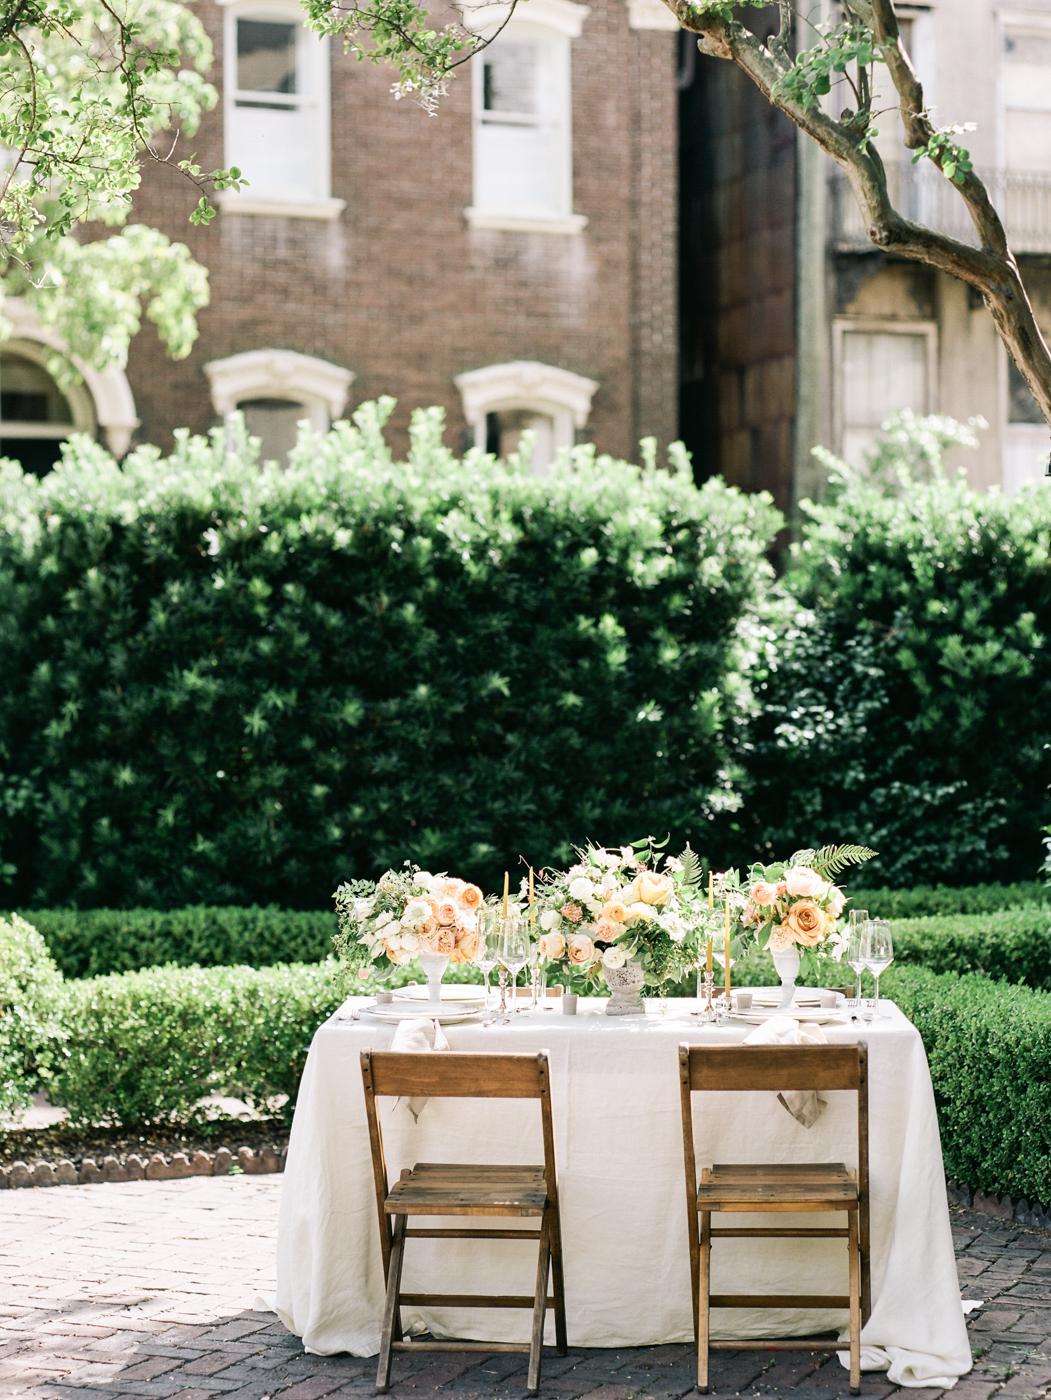 Savannah wedding flowers rentals tents